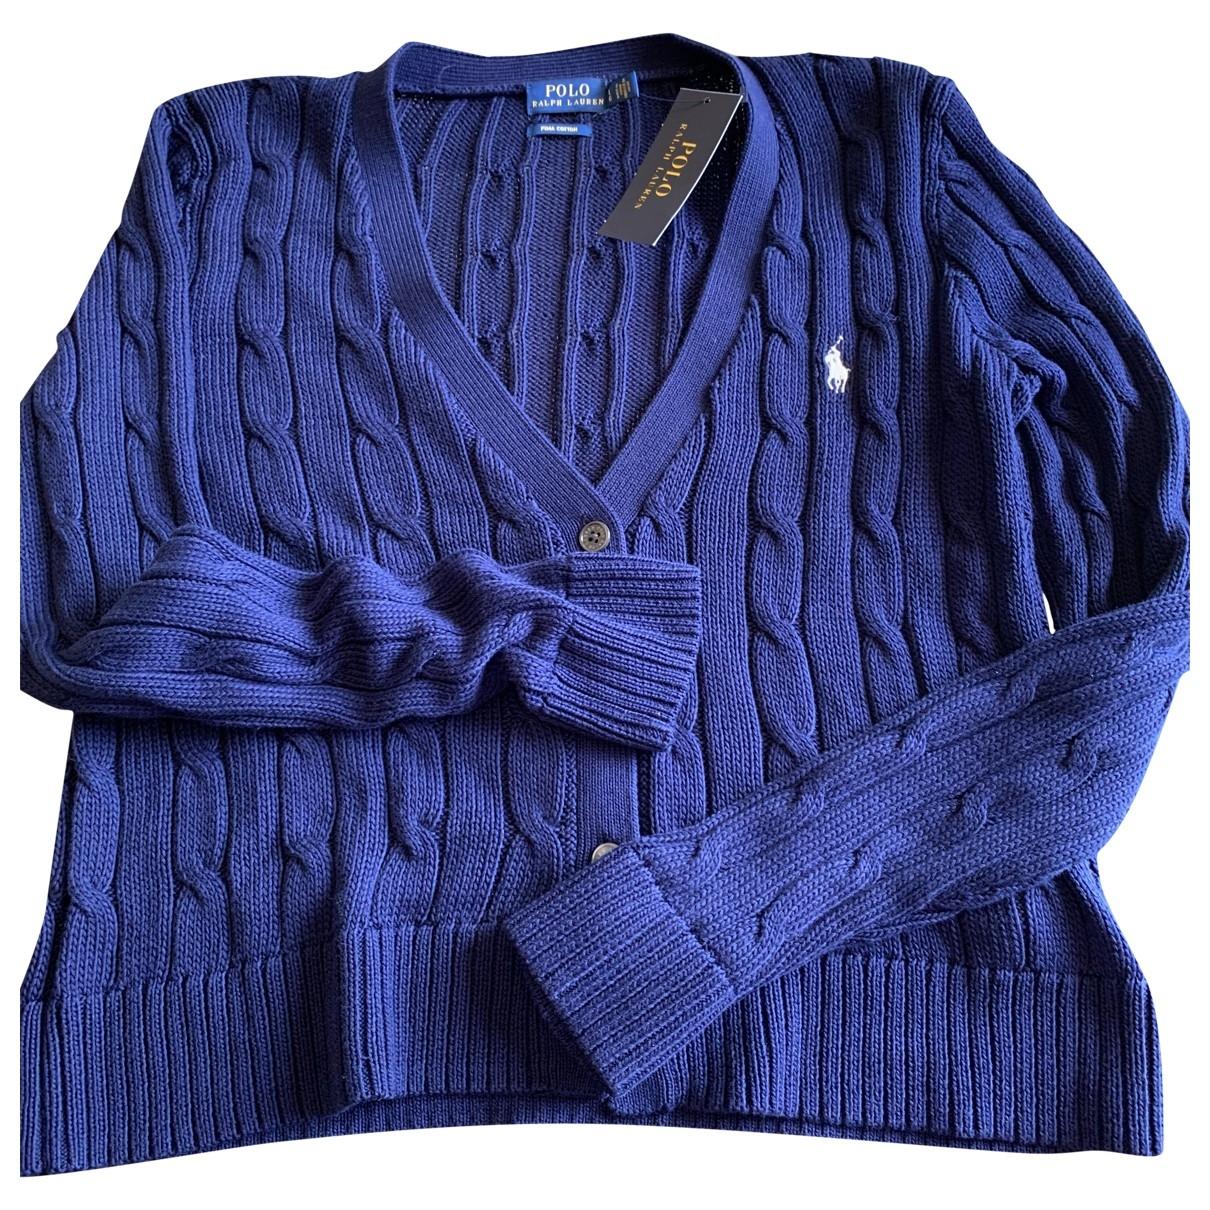 Polo Ralph Lauren \N Pullover in  Blau Baumwolle